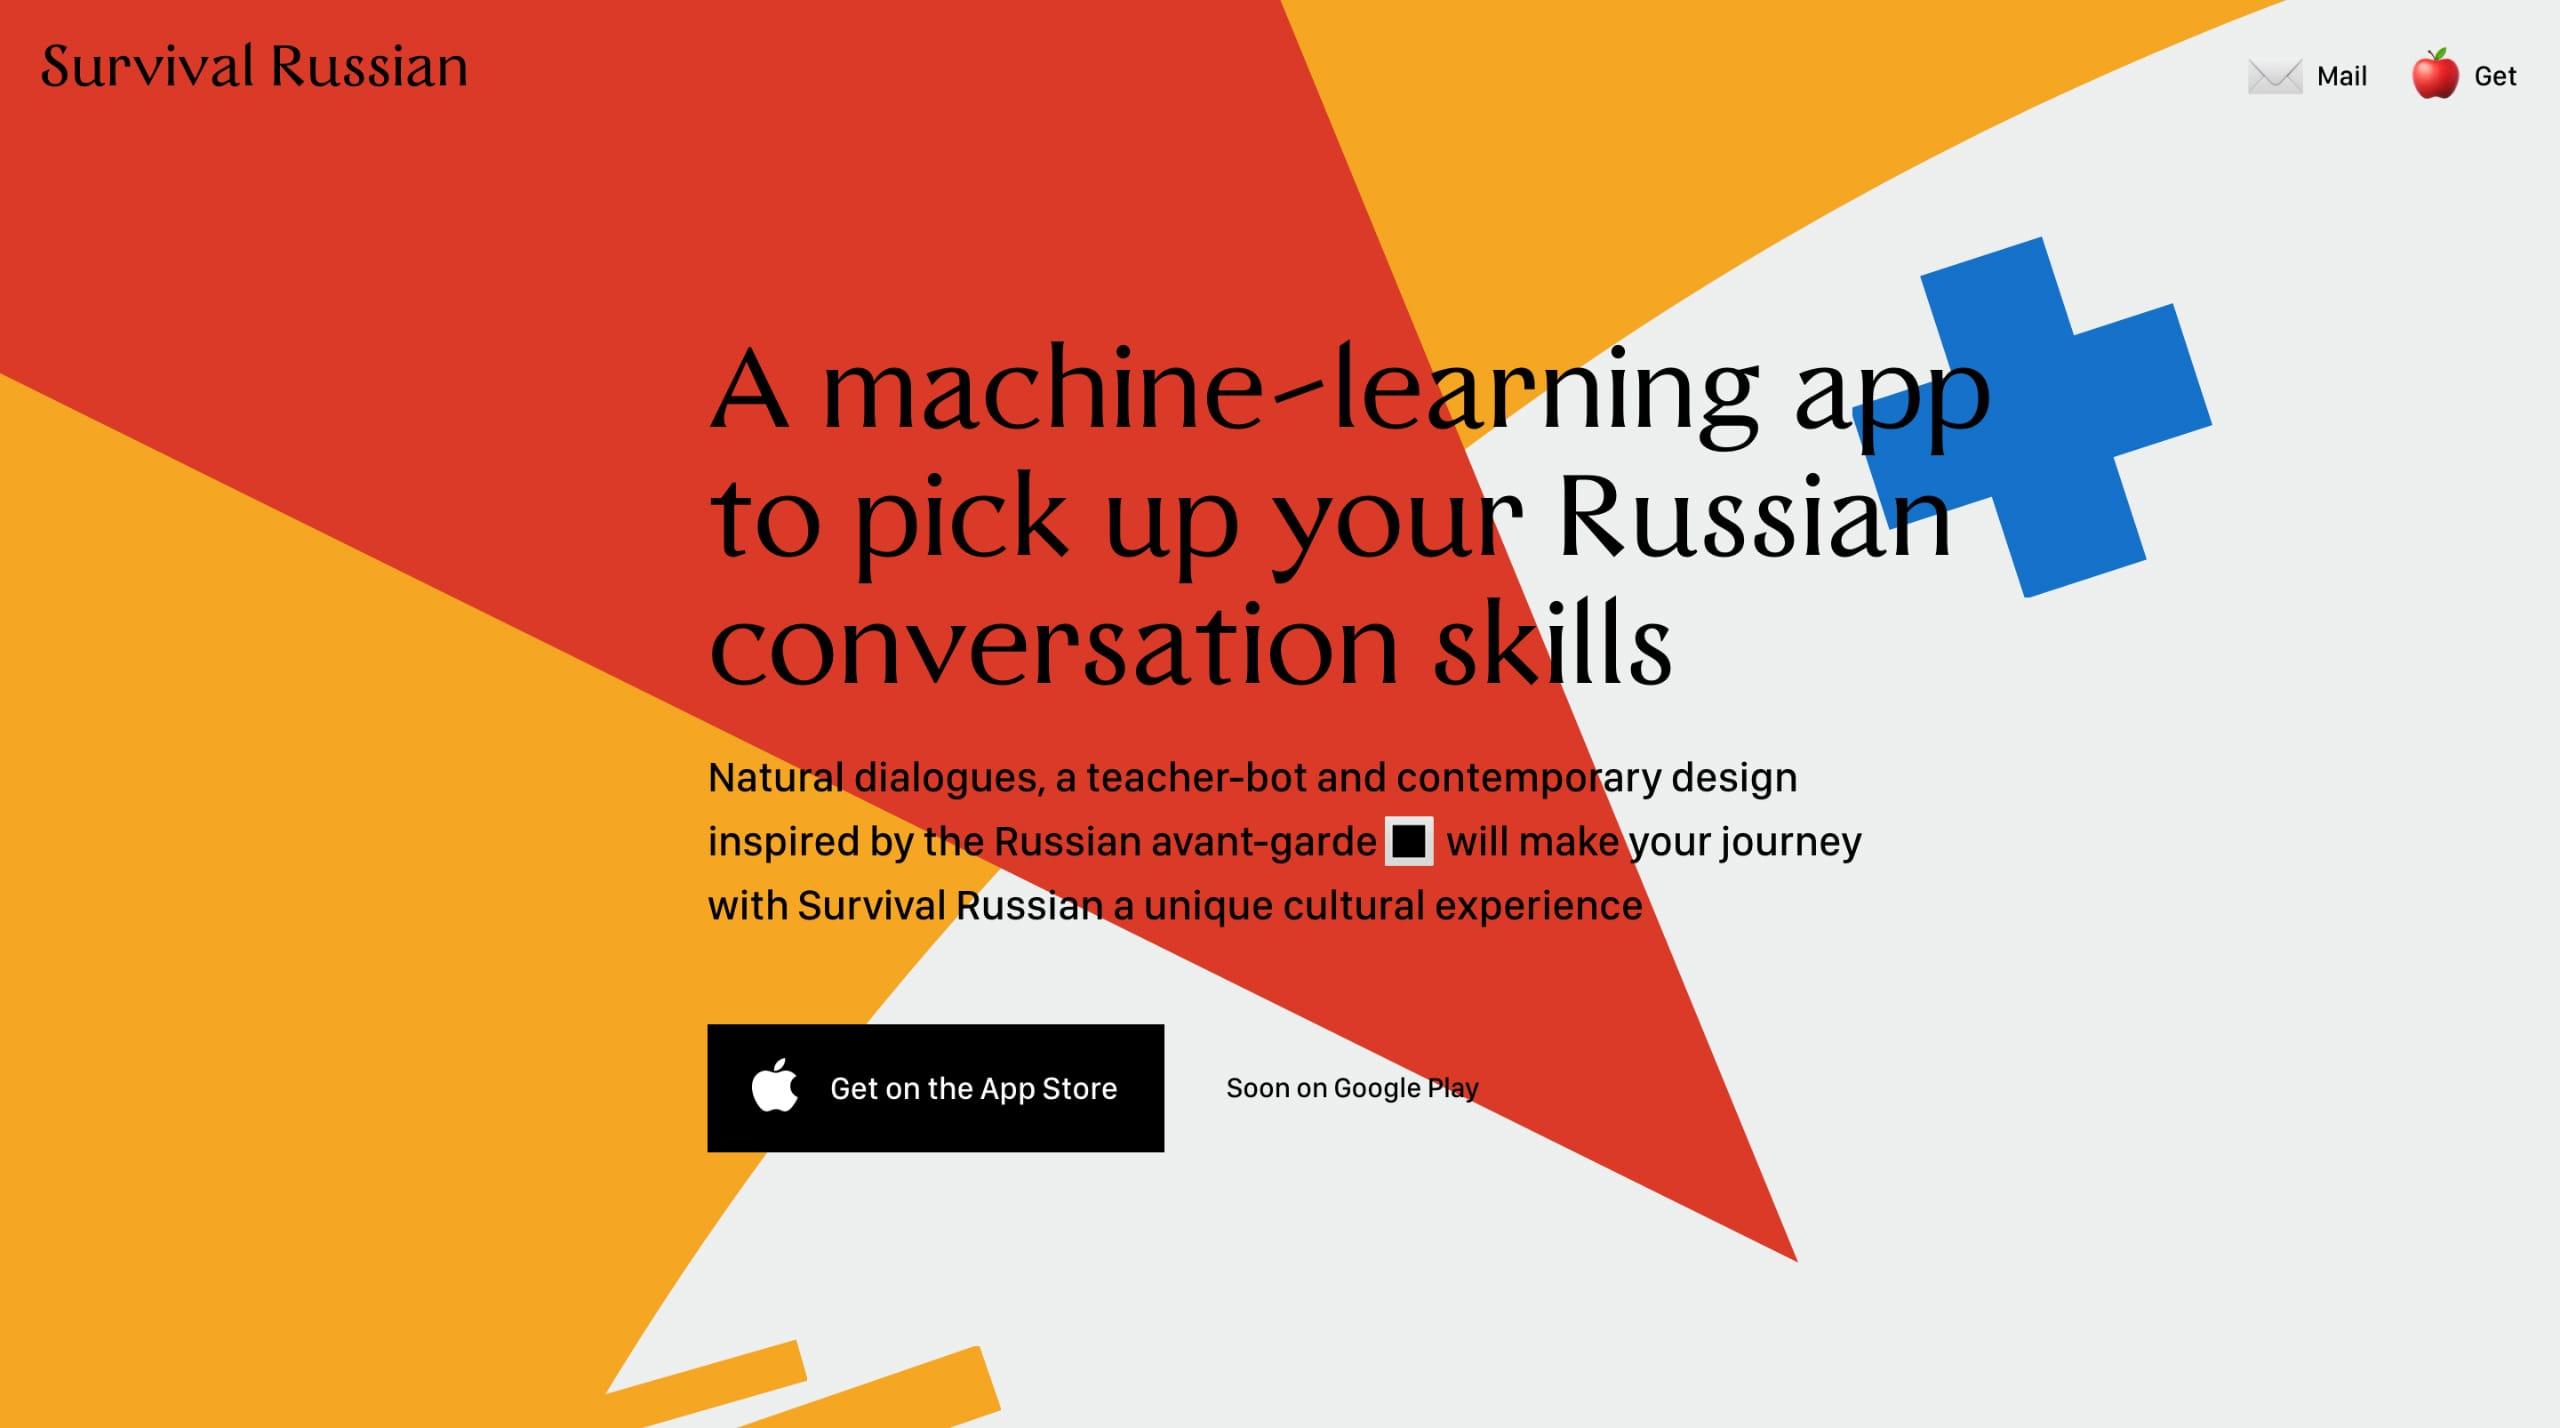 Survival Russian Website Screenshot